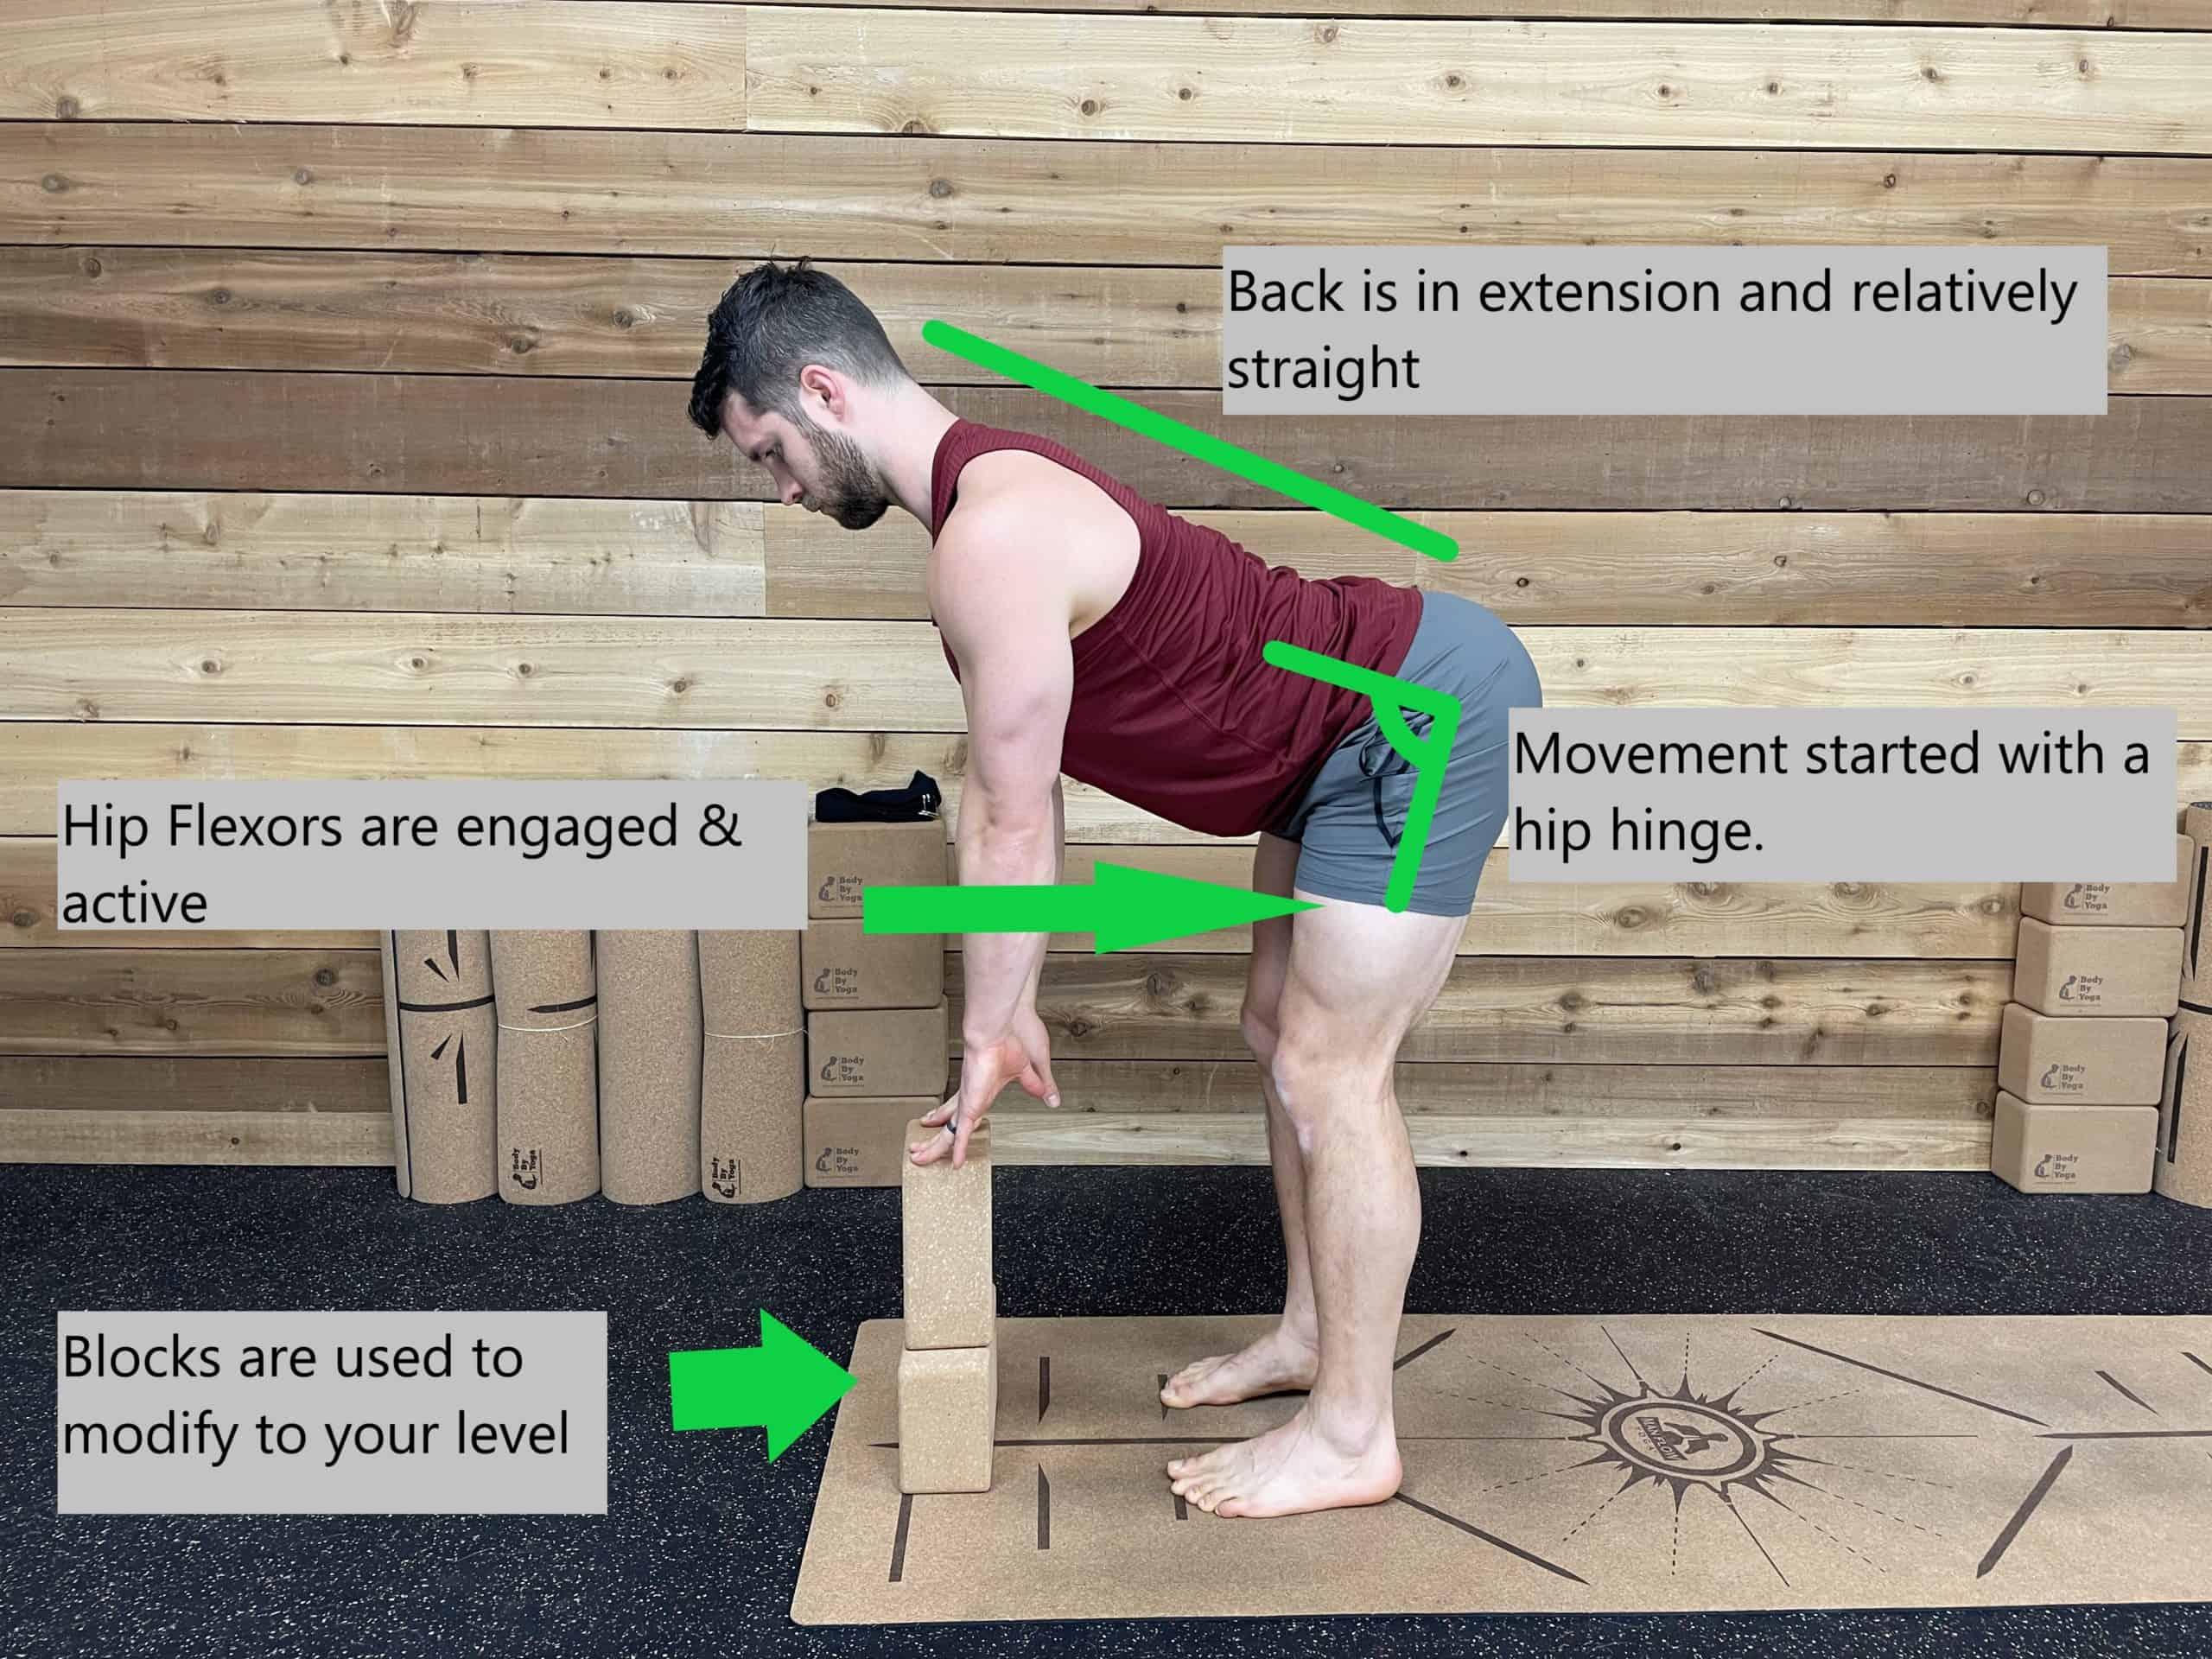 How to Use Yoga Blocks for Flexibility - Good